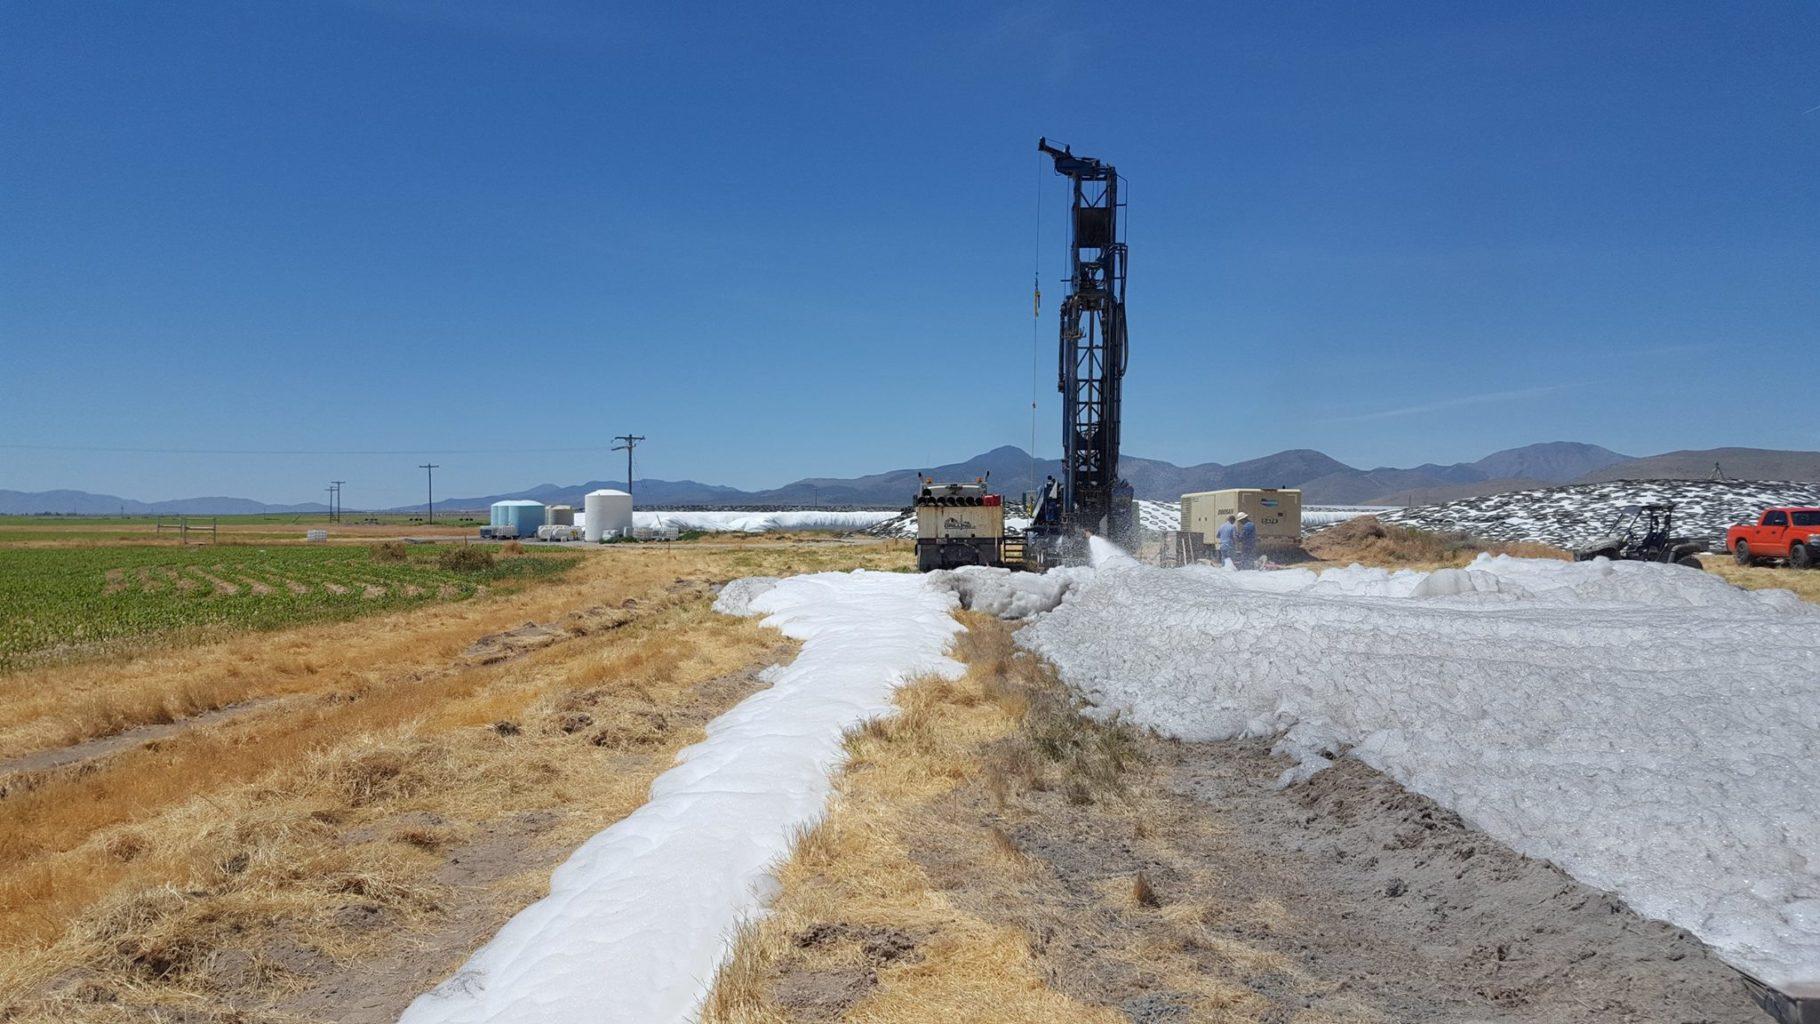 Test hole drilling Utah